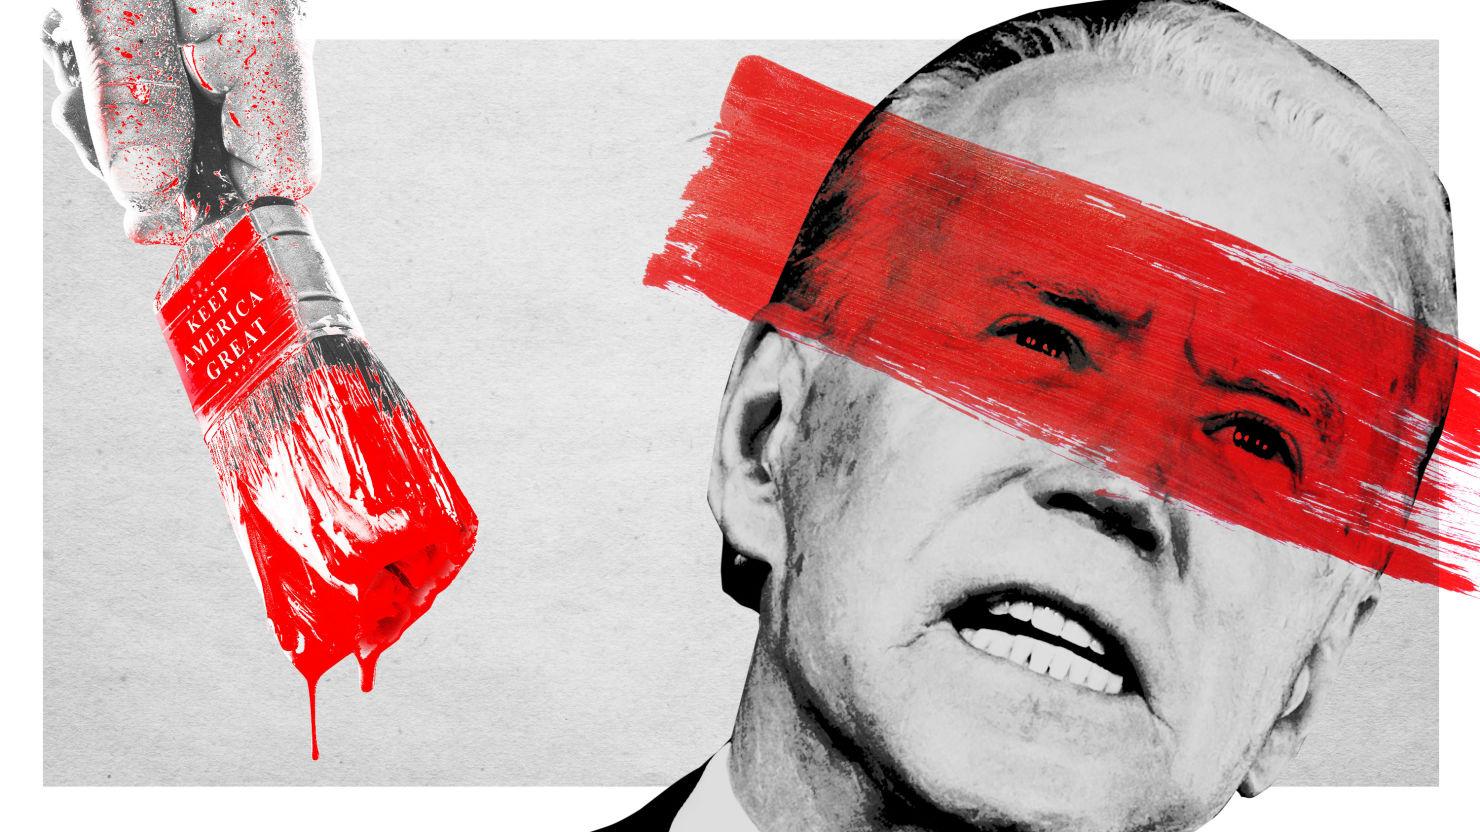 Biden's Leftist Critics' Trump-y Play: Paint Joe as Senile